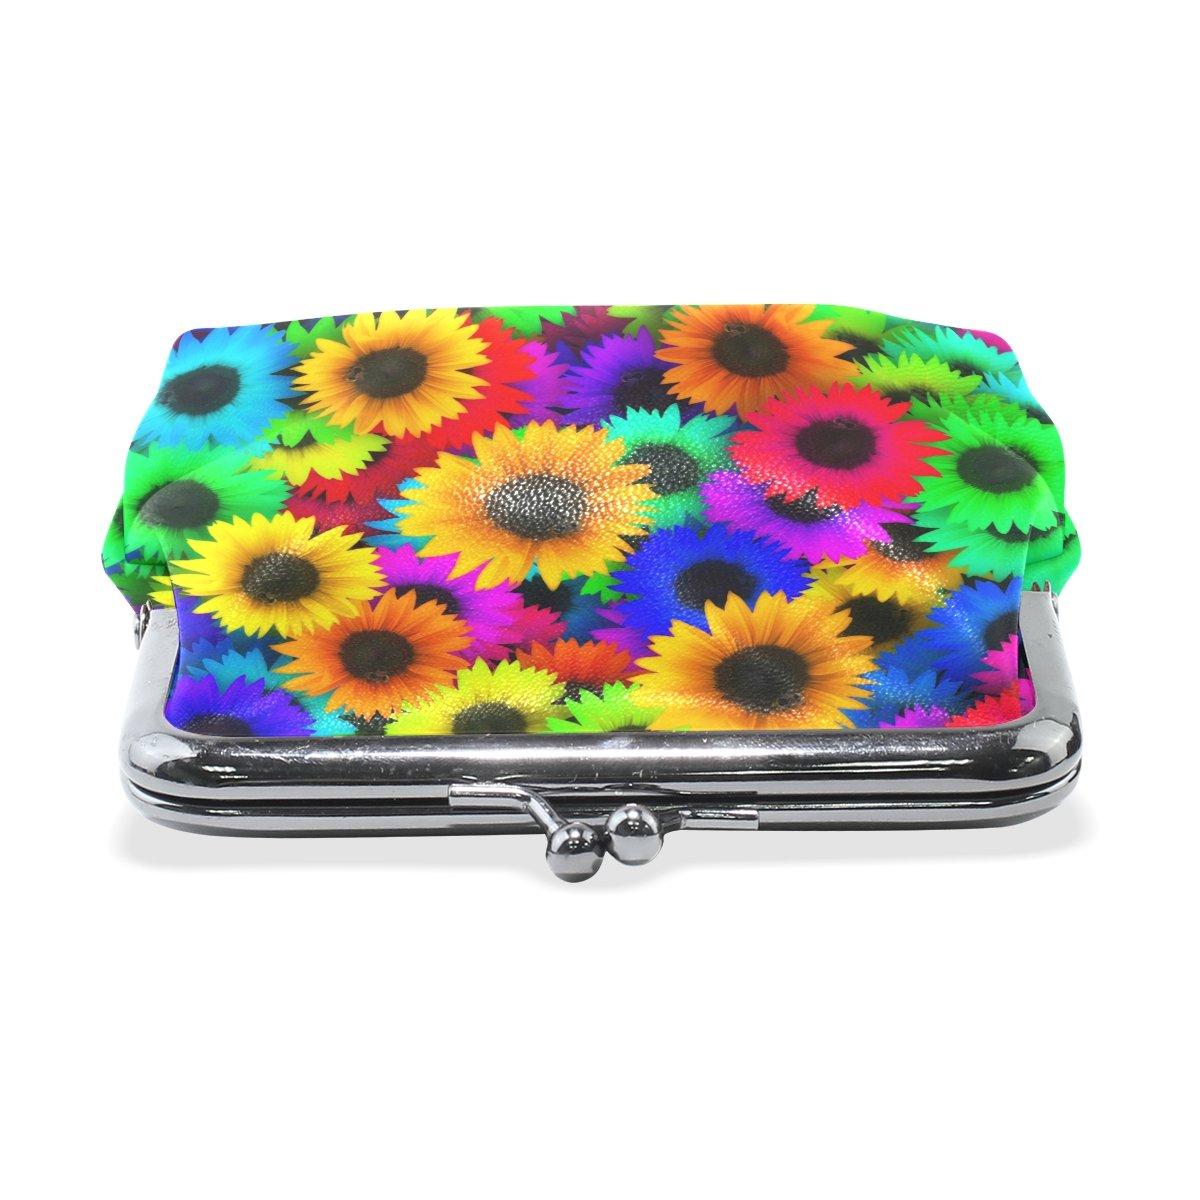 Coin Purse Sunflower Colorful Wallet Buckle Clutch Handbag For Women Girls Gift